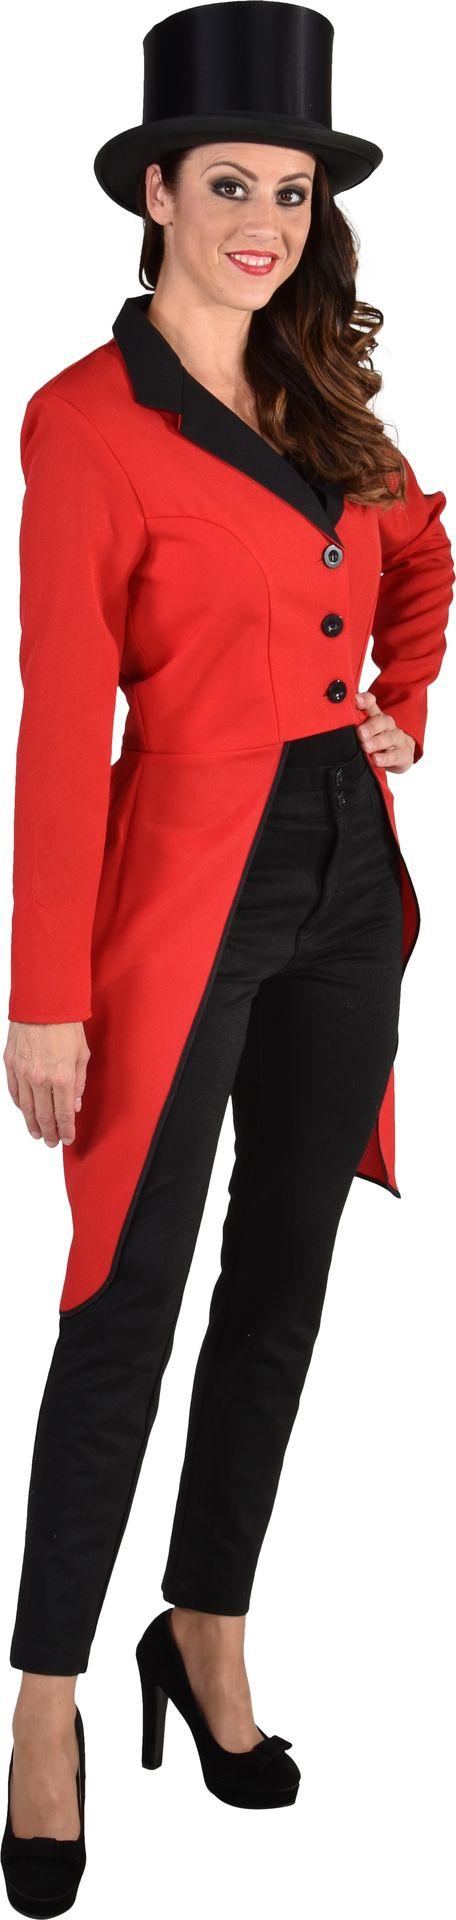 Slipjas dames rood